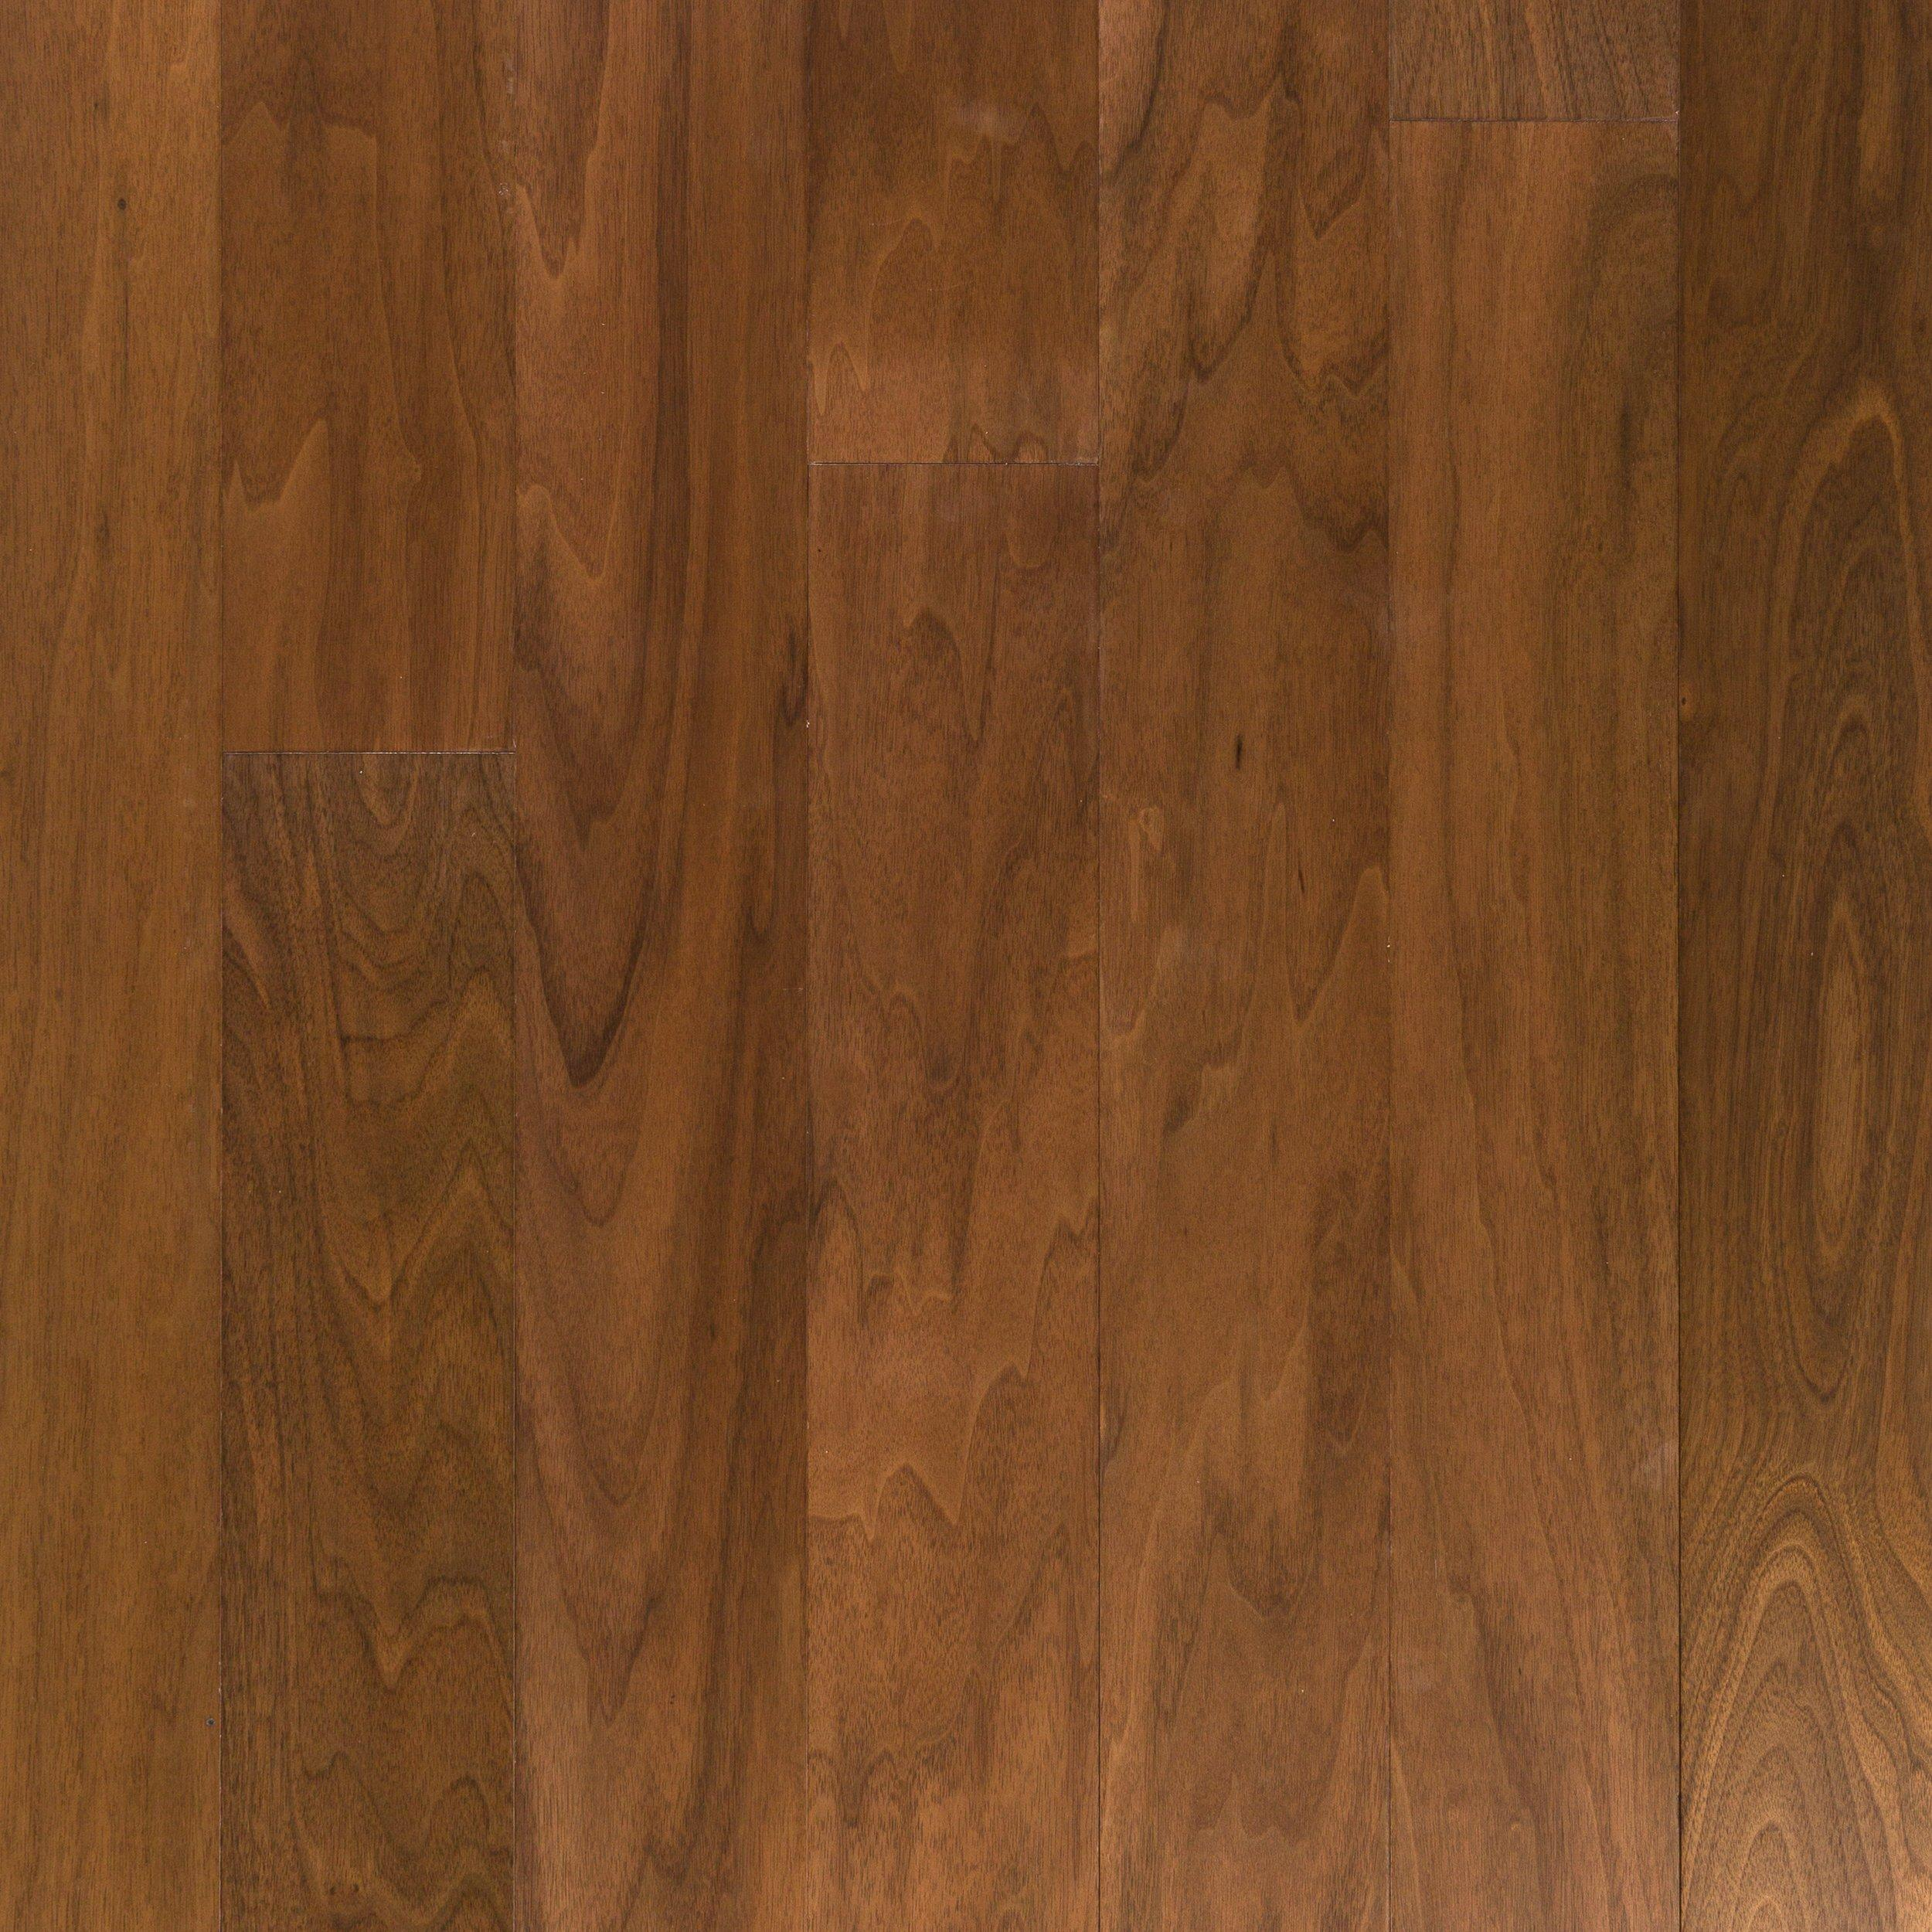 Walnut Wood Flooring  Floor  Decor